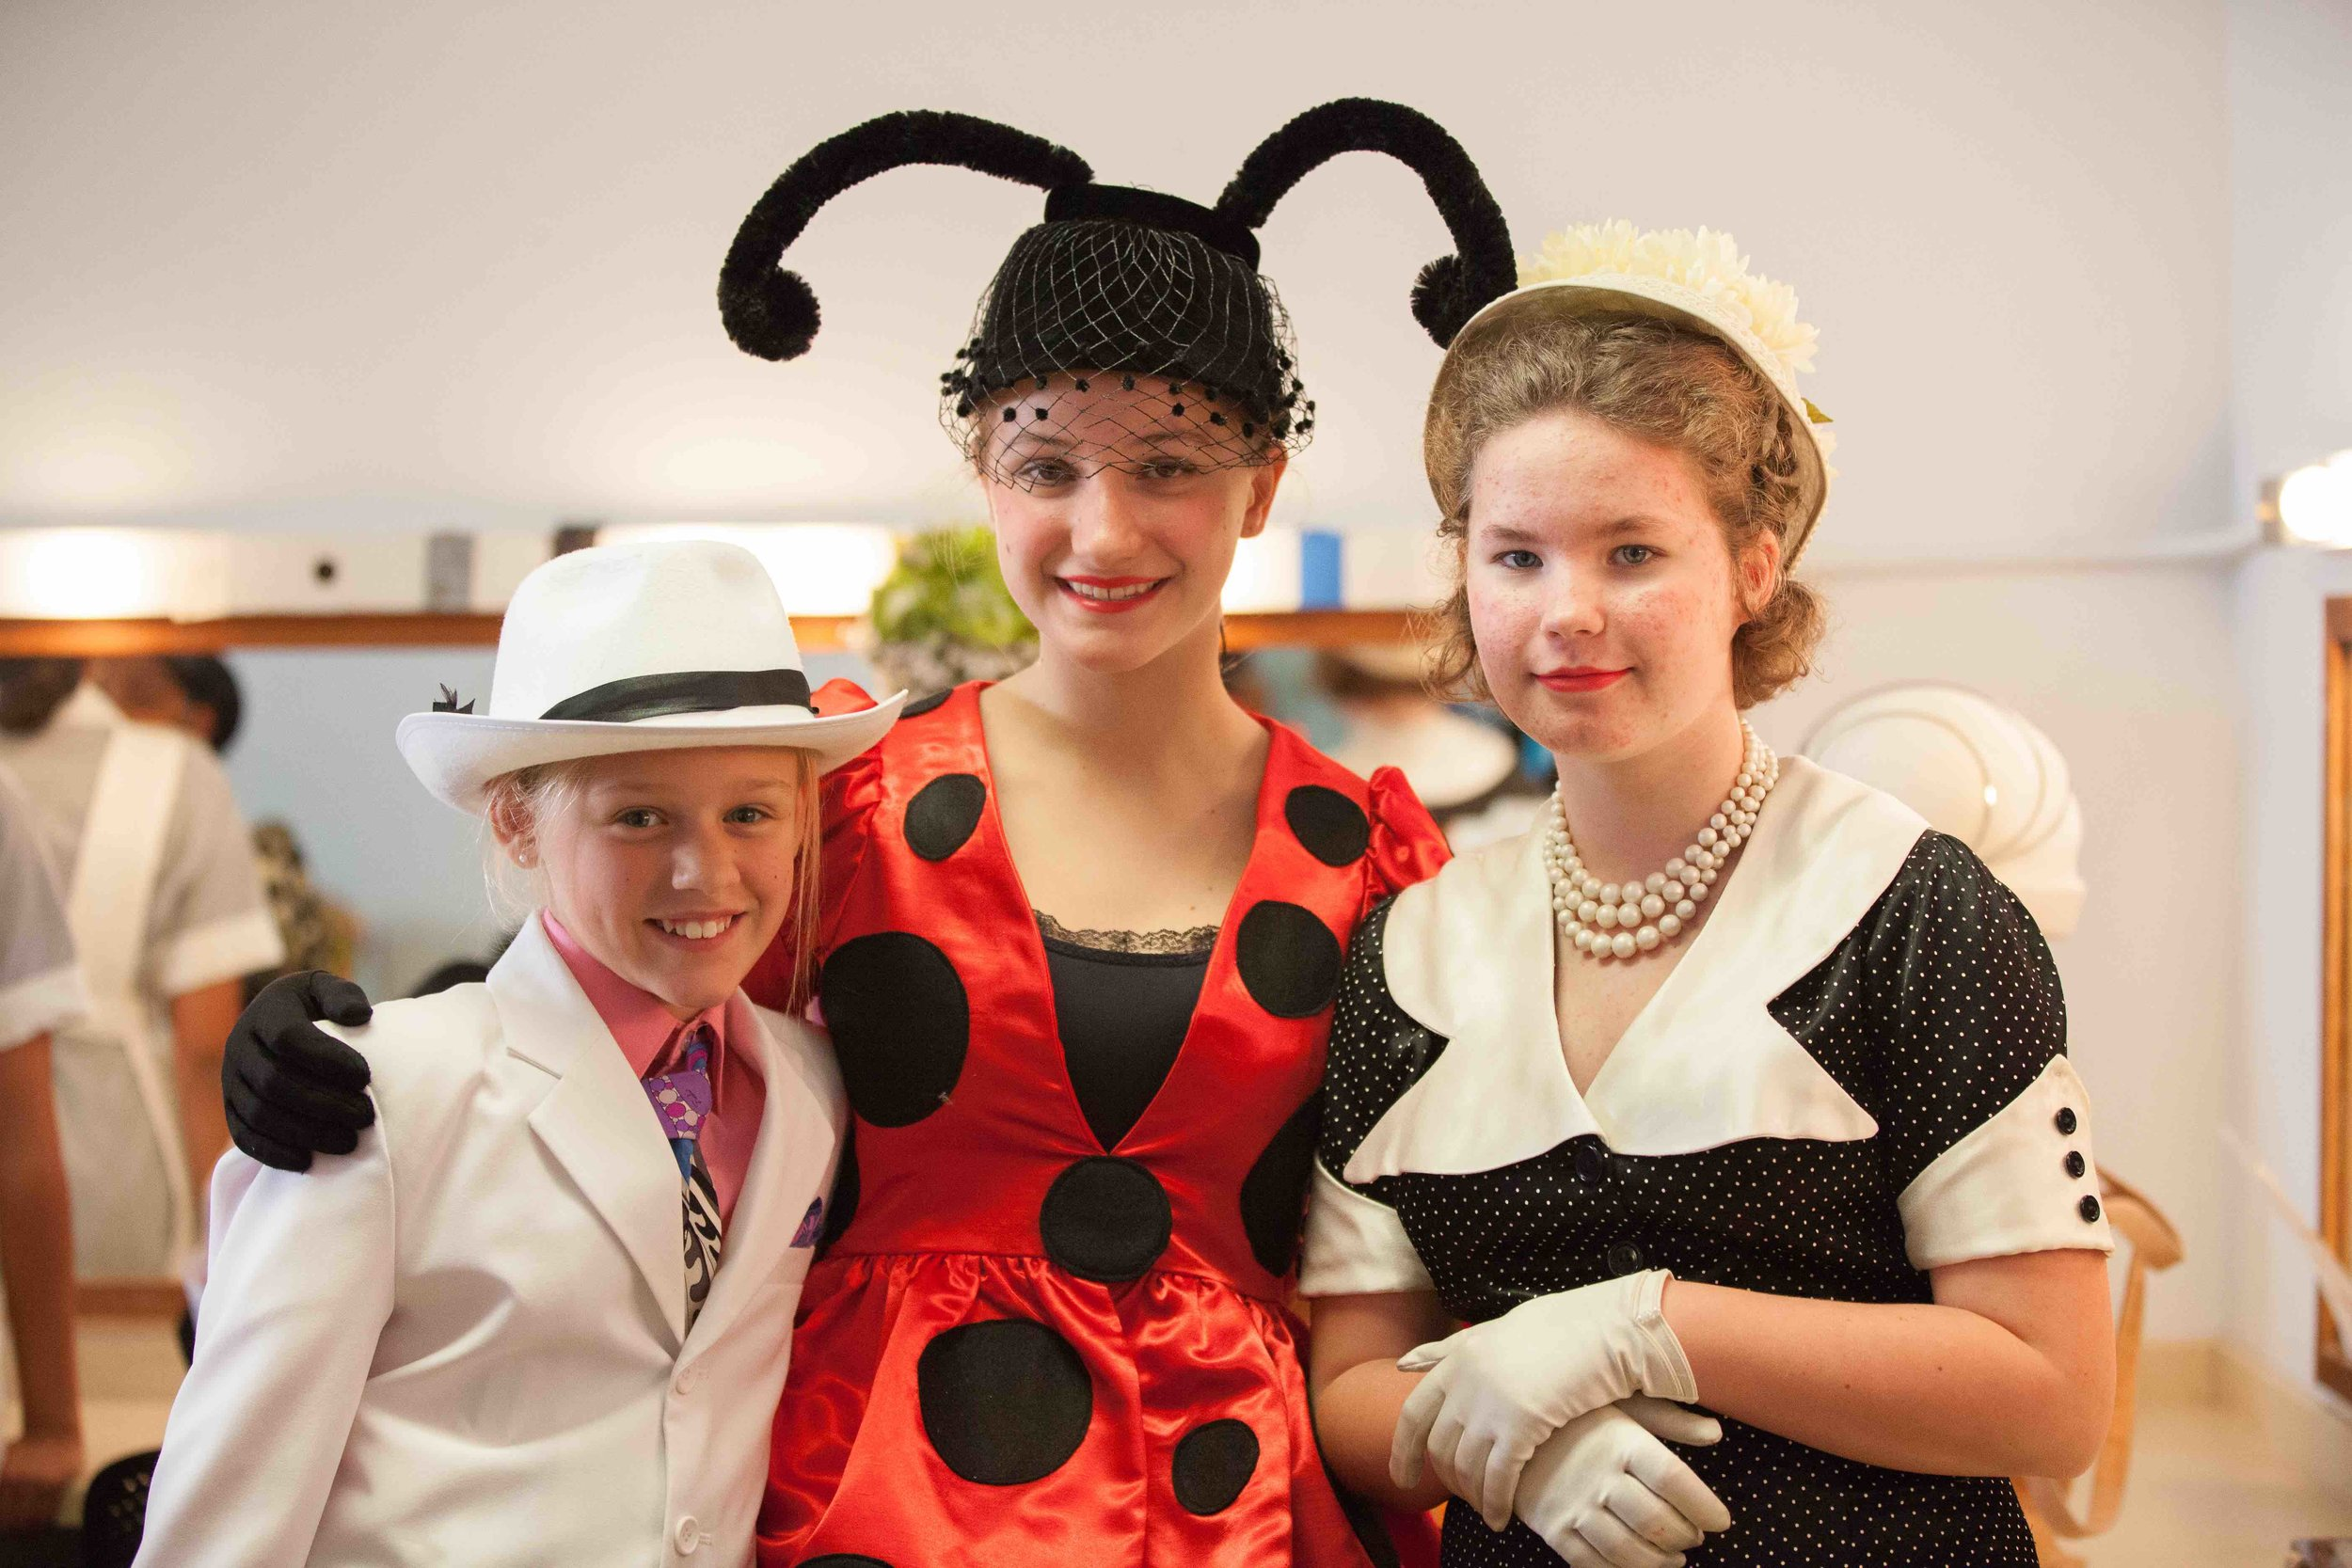 Ladybug and Townfolk